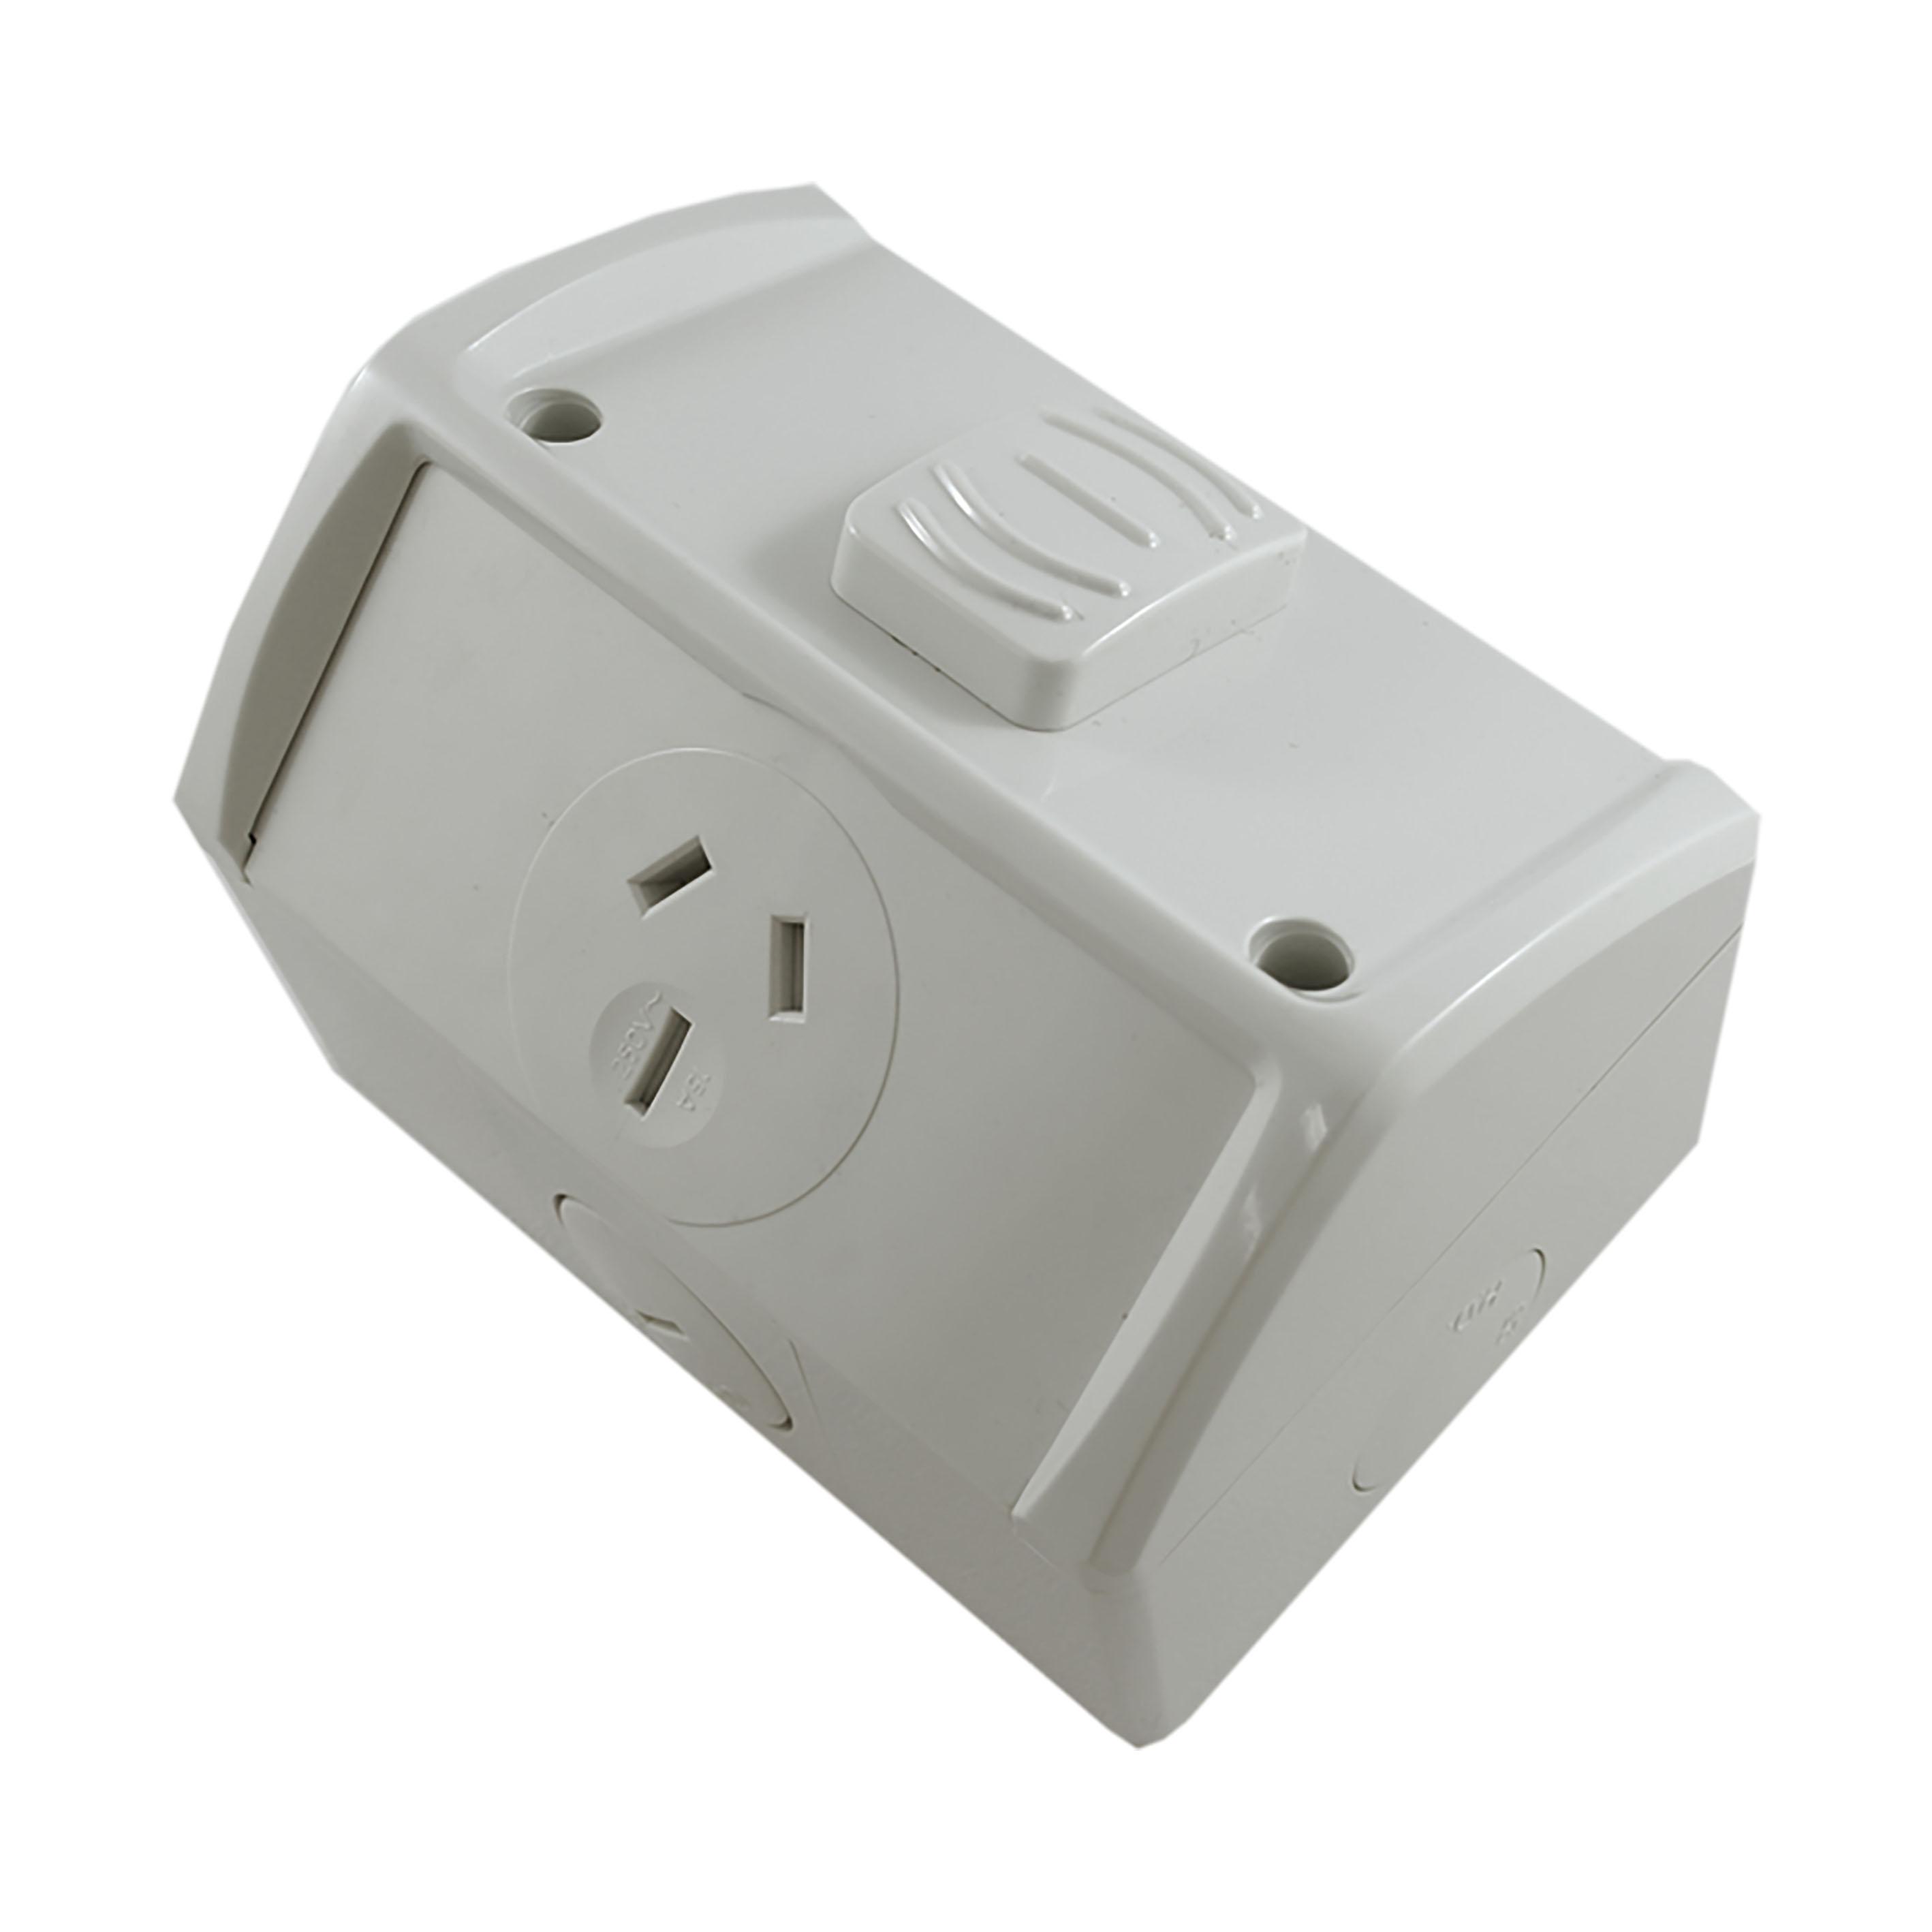 Buy a Single Weatherproof Socket Outlet 15A - NEW STYLE Online in ...